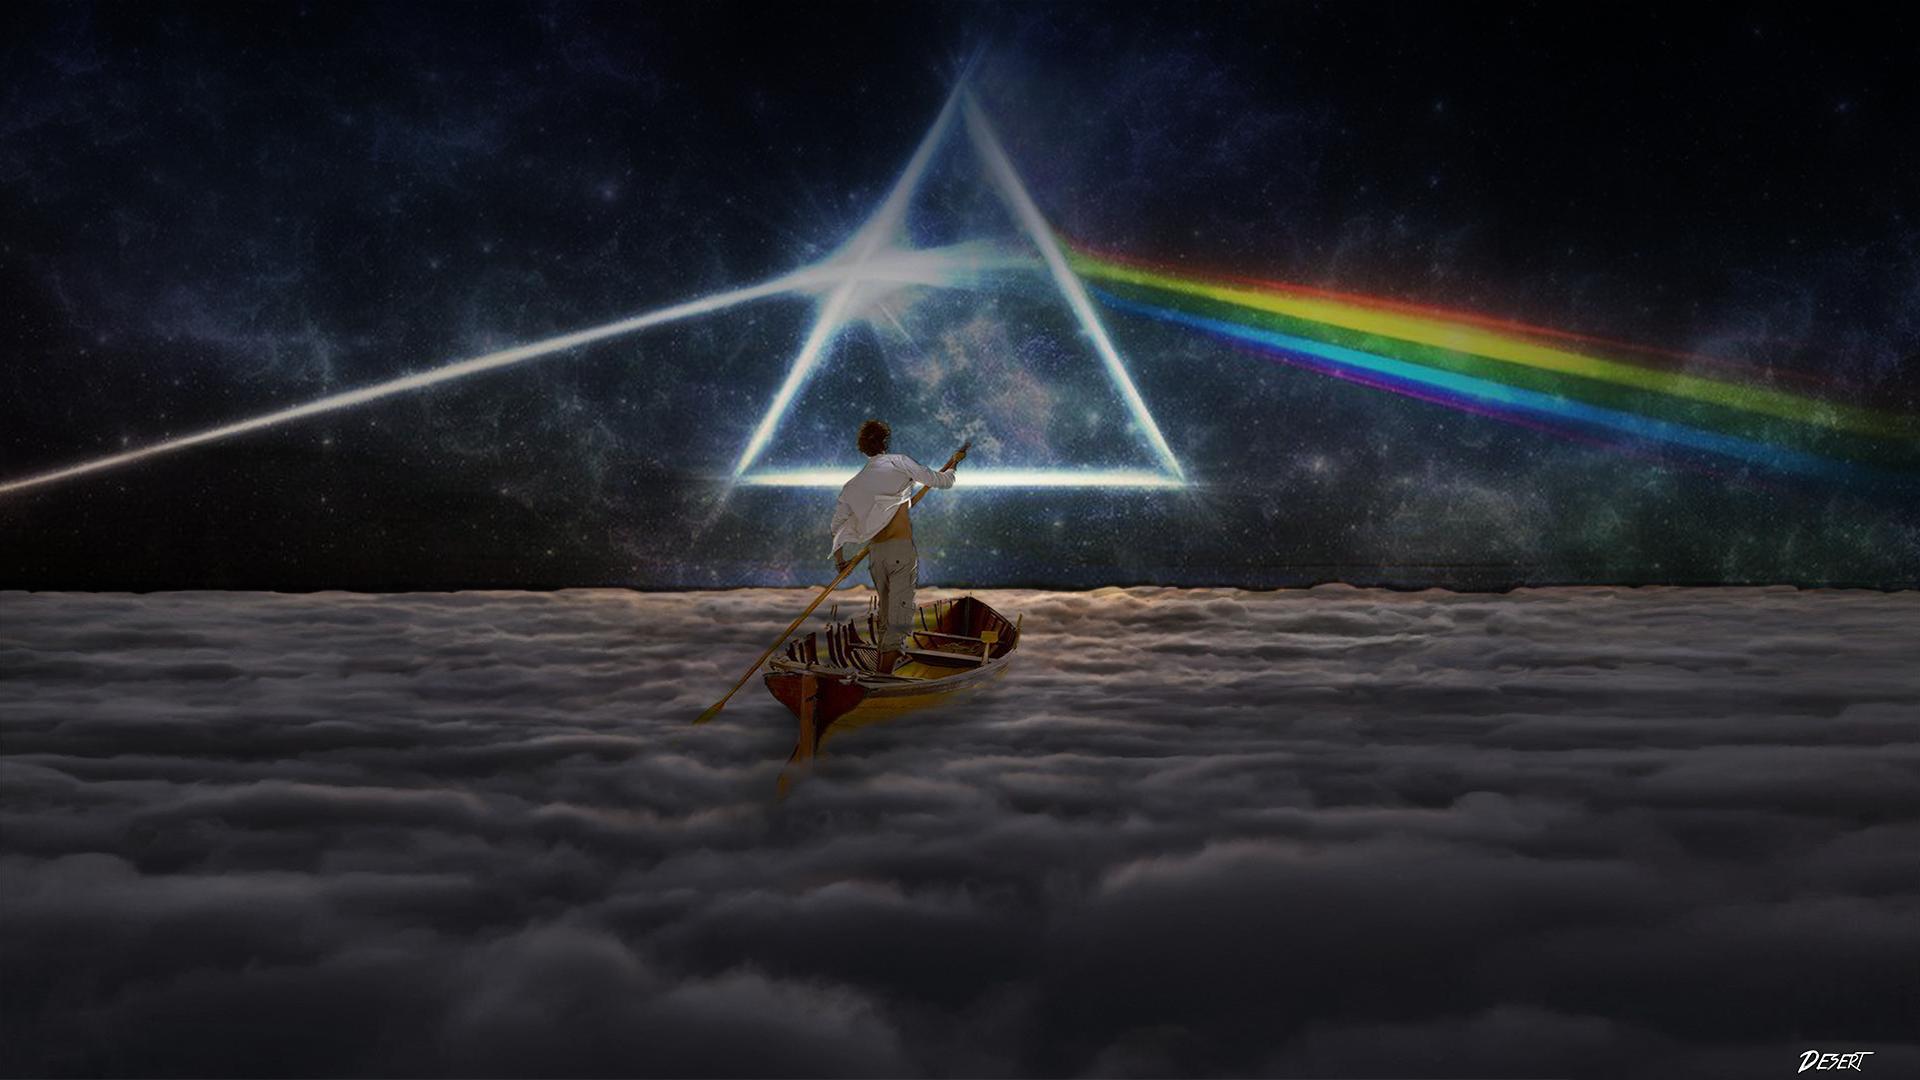 Pink Floyd Wallpaper By DesertWiggle On DeviantArt